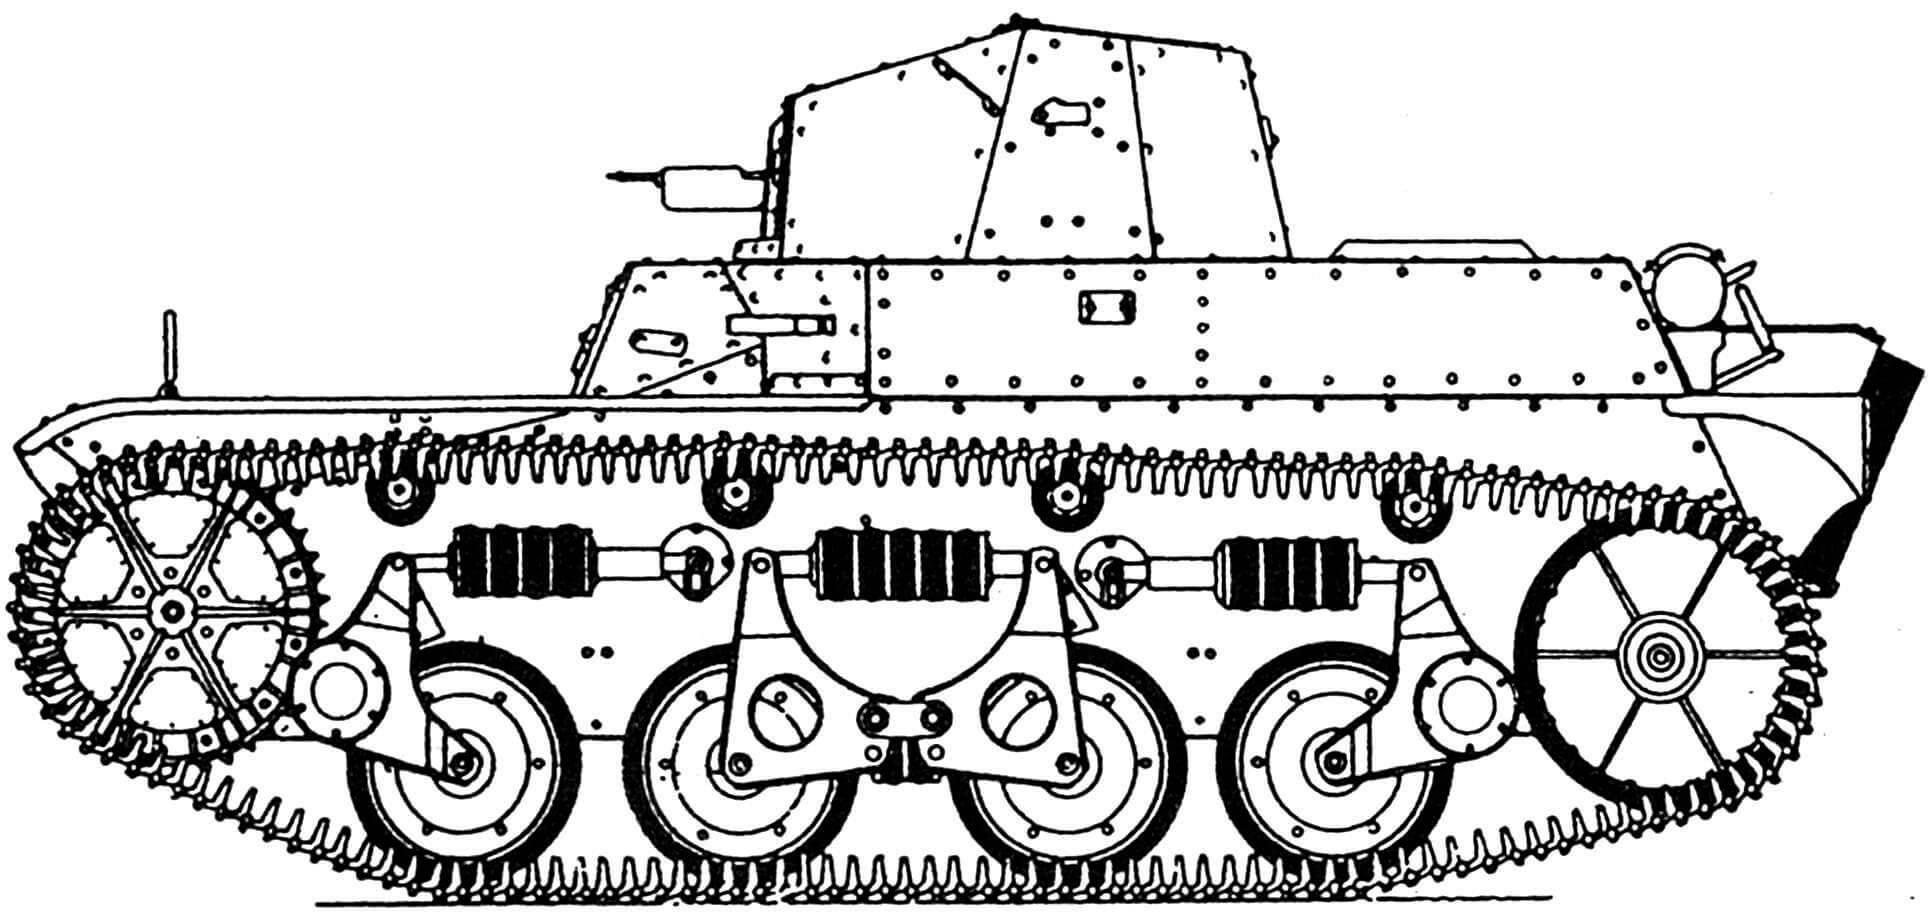 AMR-34(ZT)